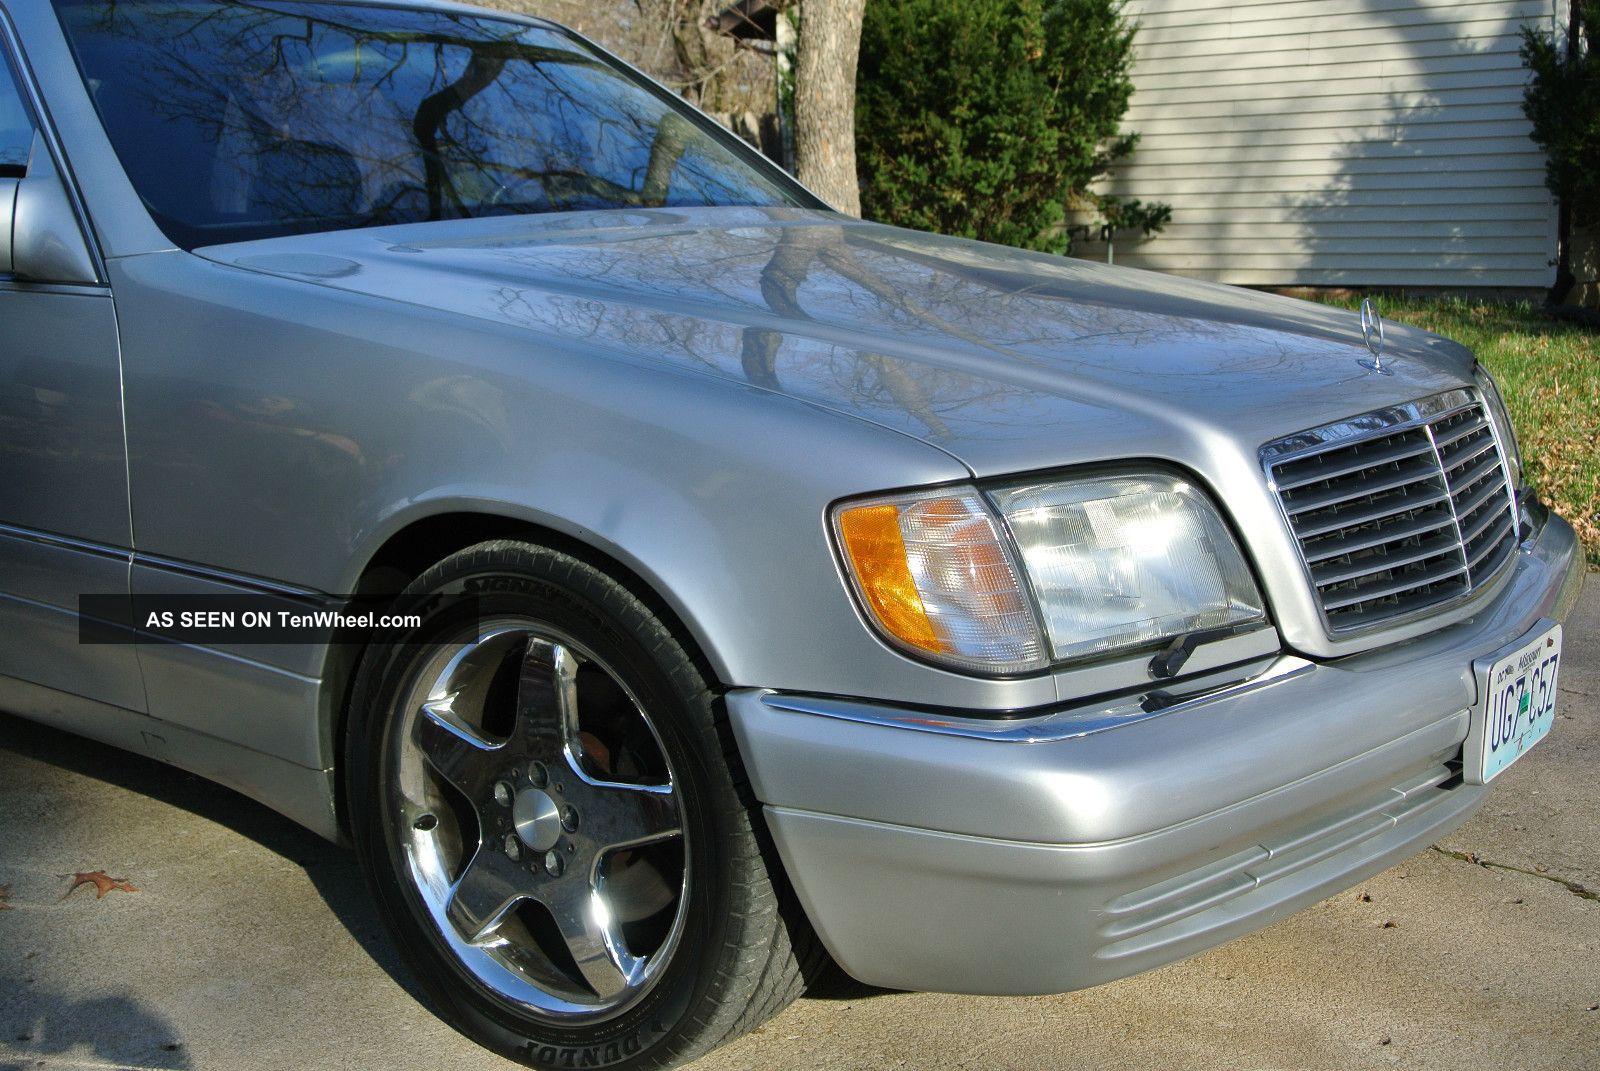 1995 mercedes benz s600 base sedan 4 door 6 0l for 1995 mercedes benz s600 coupe